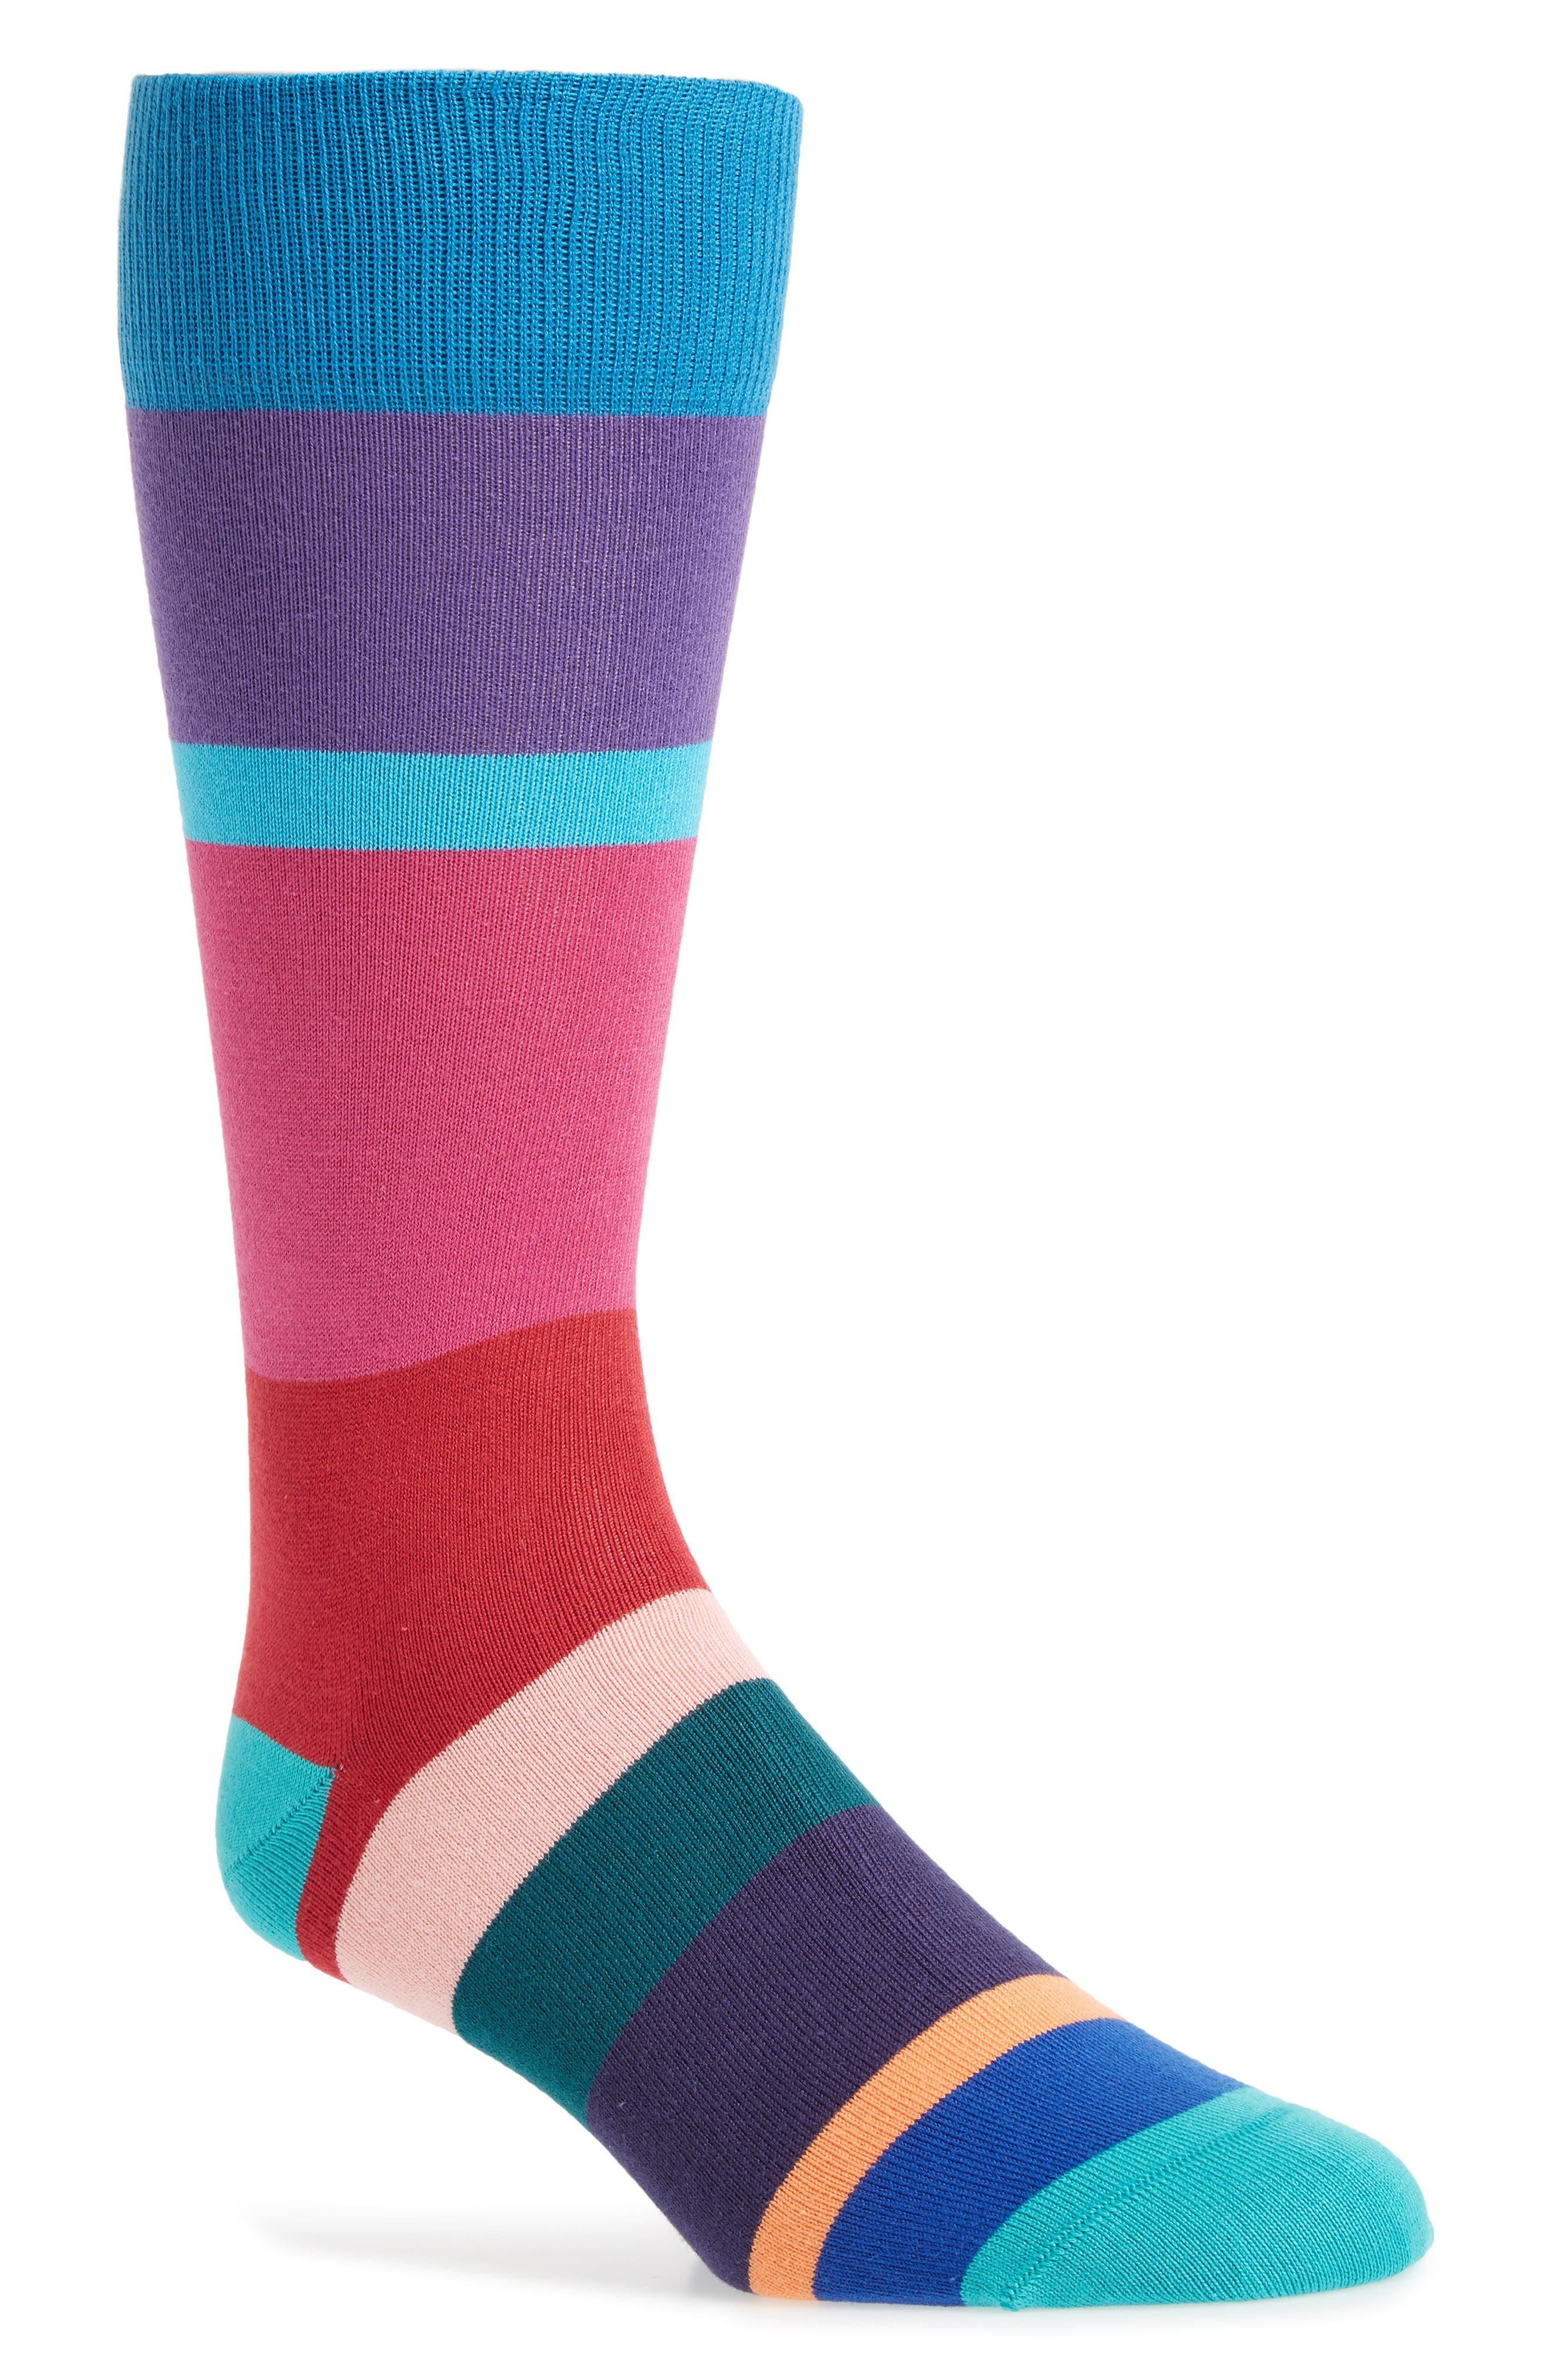 Jolly Colorblock Socks,                             Main thumbnail 1, color,                             Green/ Blue Multi